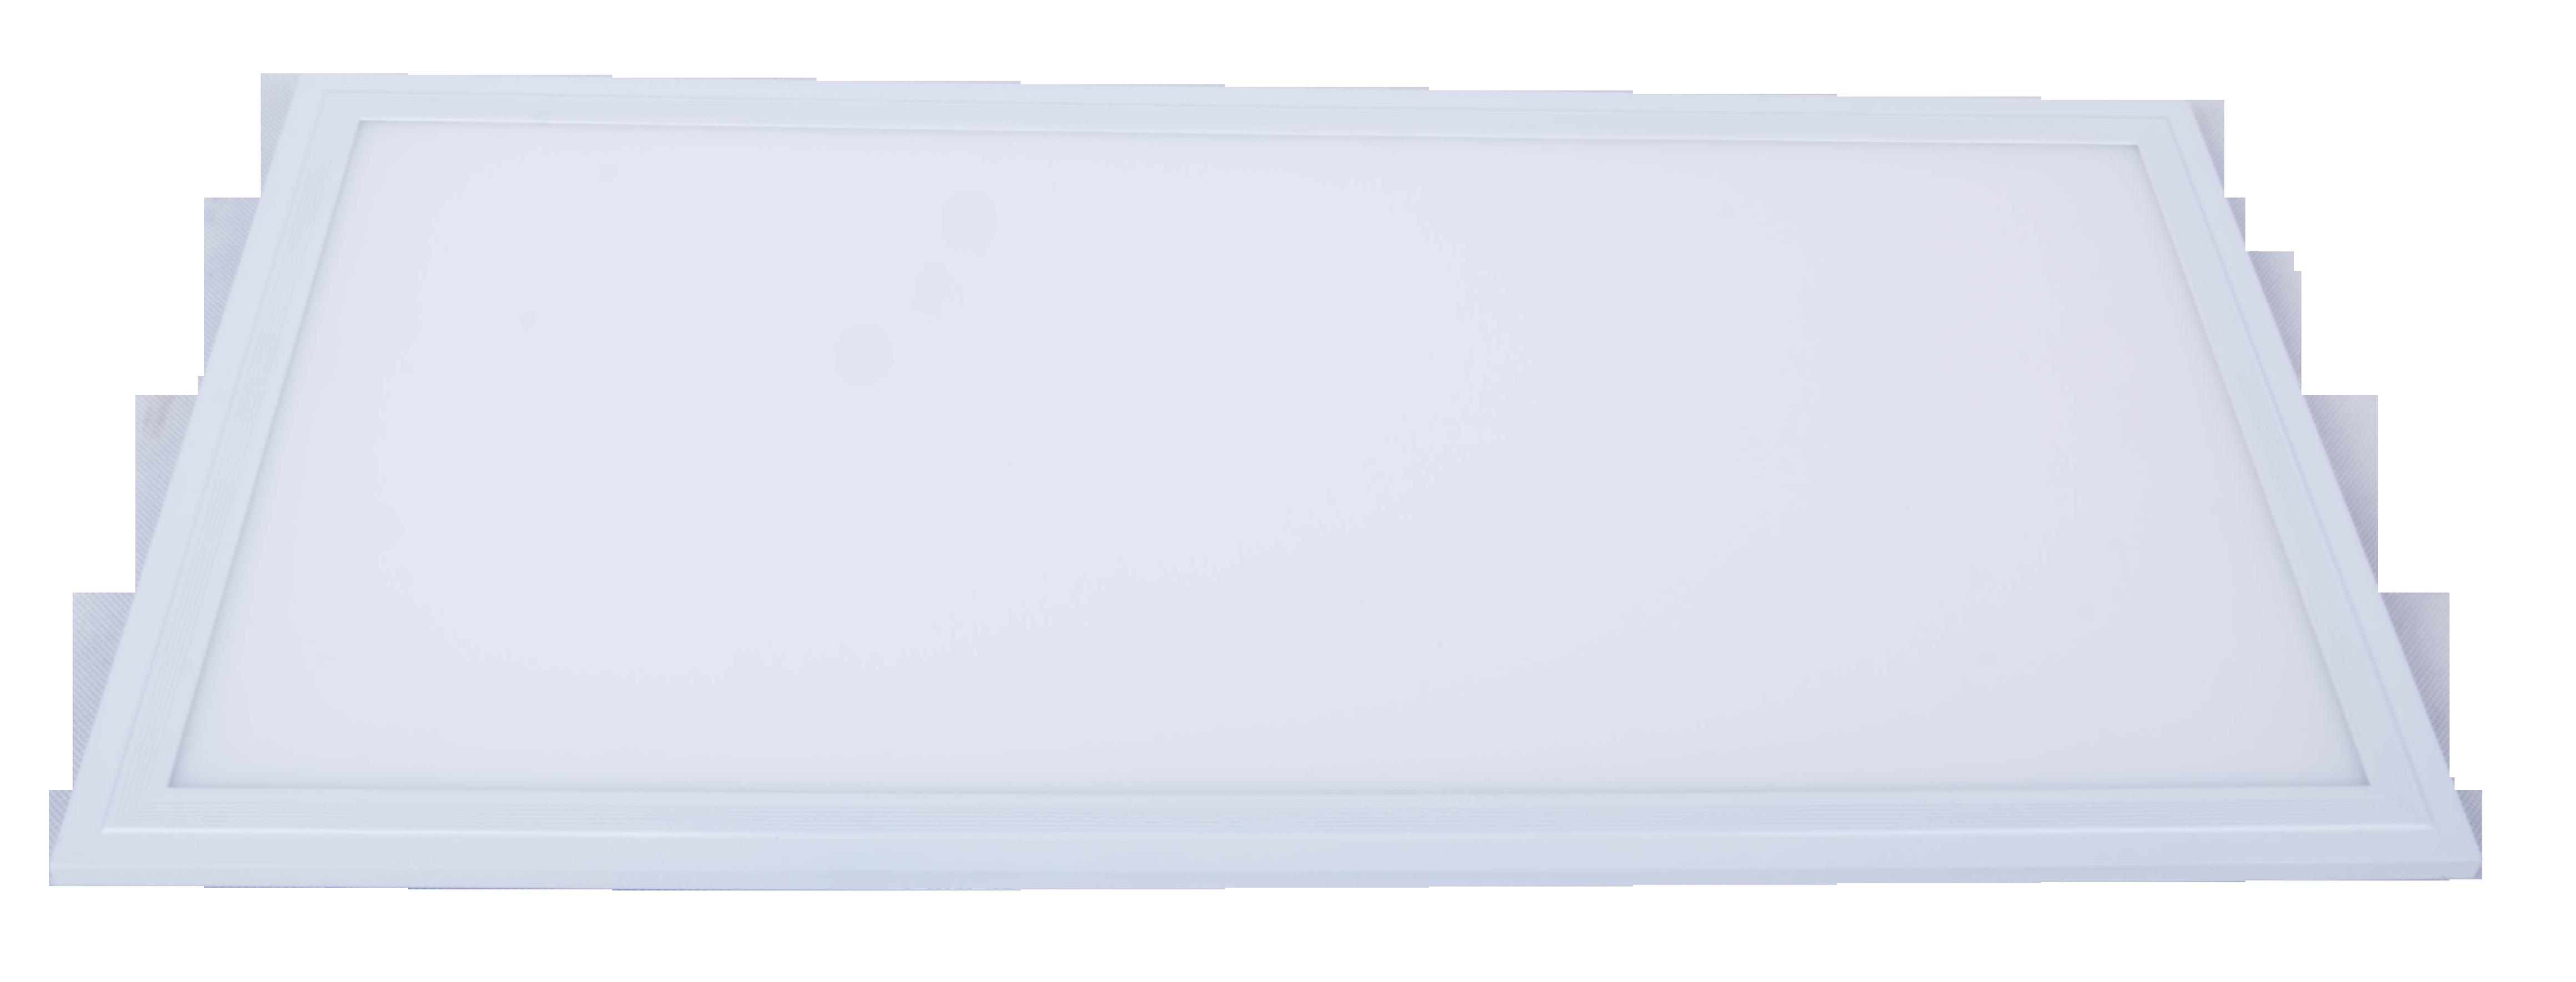 LED LIGHT PANEL - 27W - 300mm X 600mm - 4000K